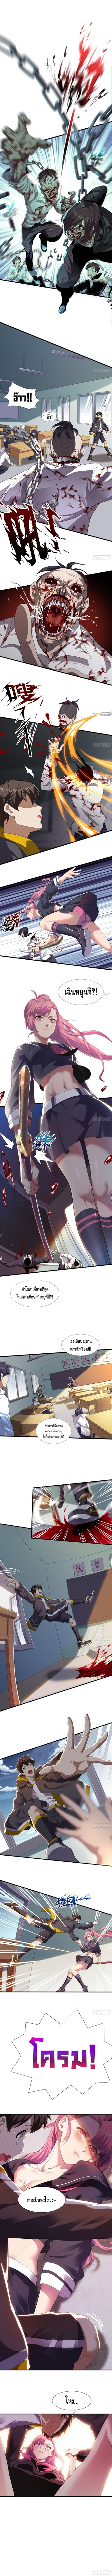 Infinite Viral Infection - หน้า 5